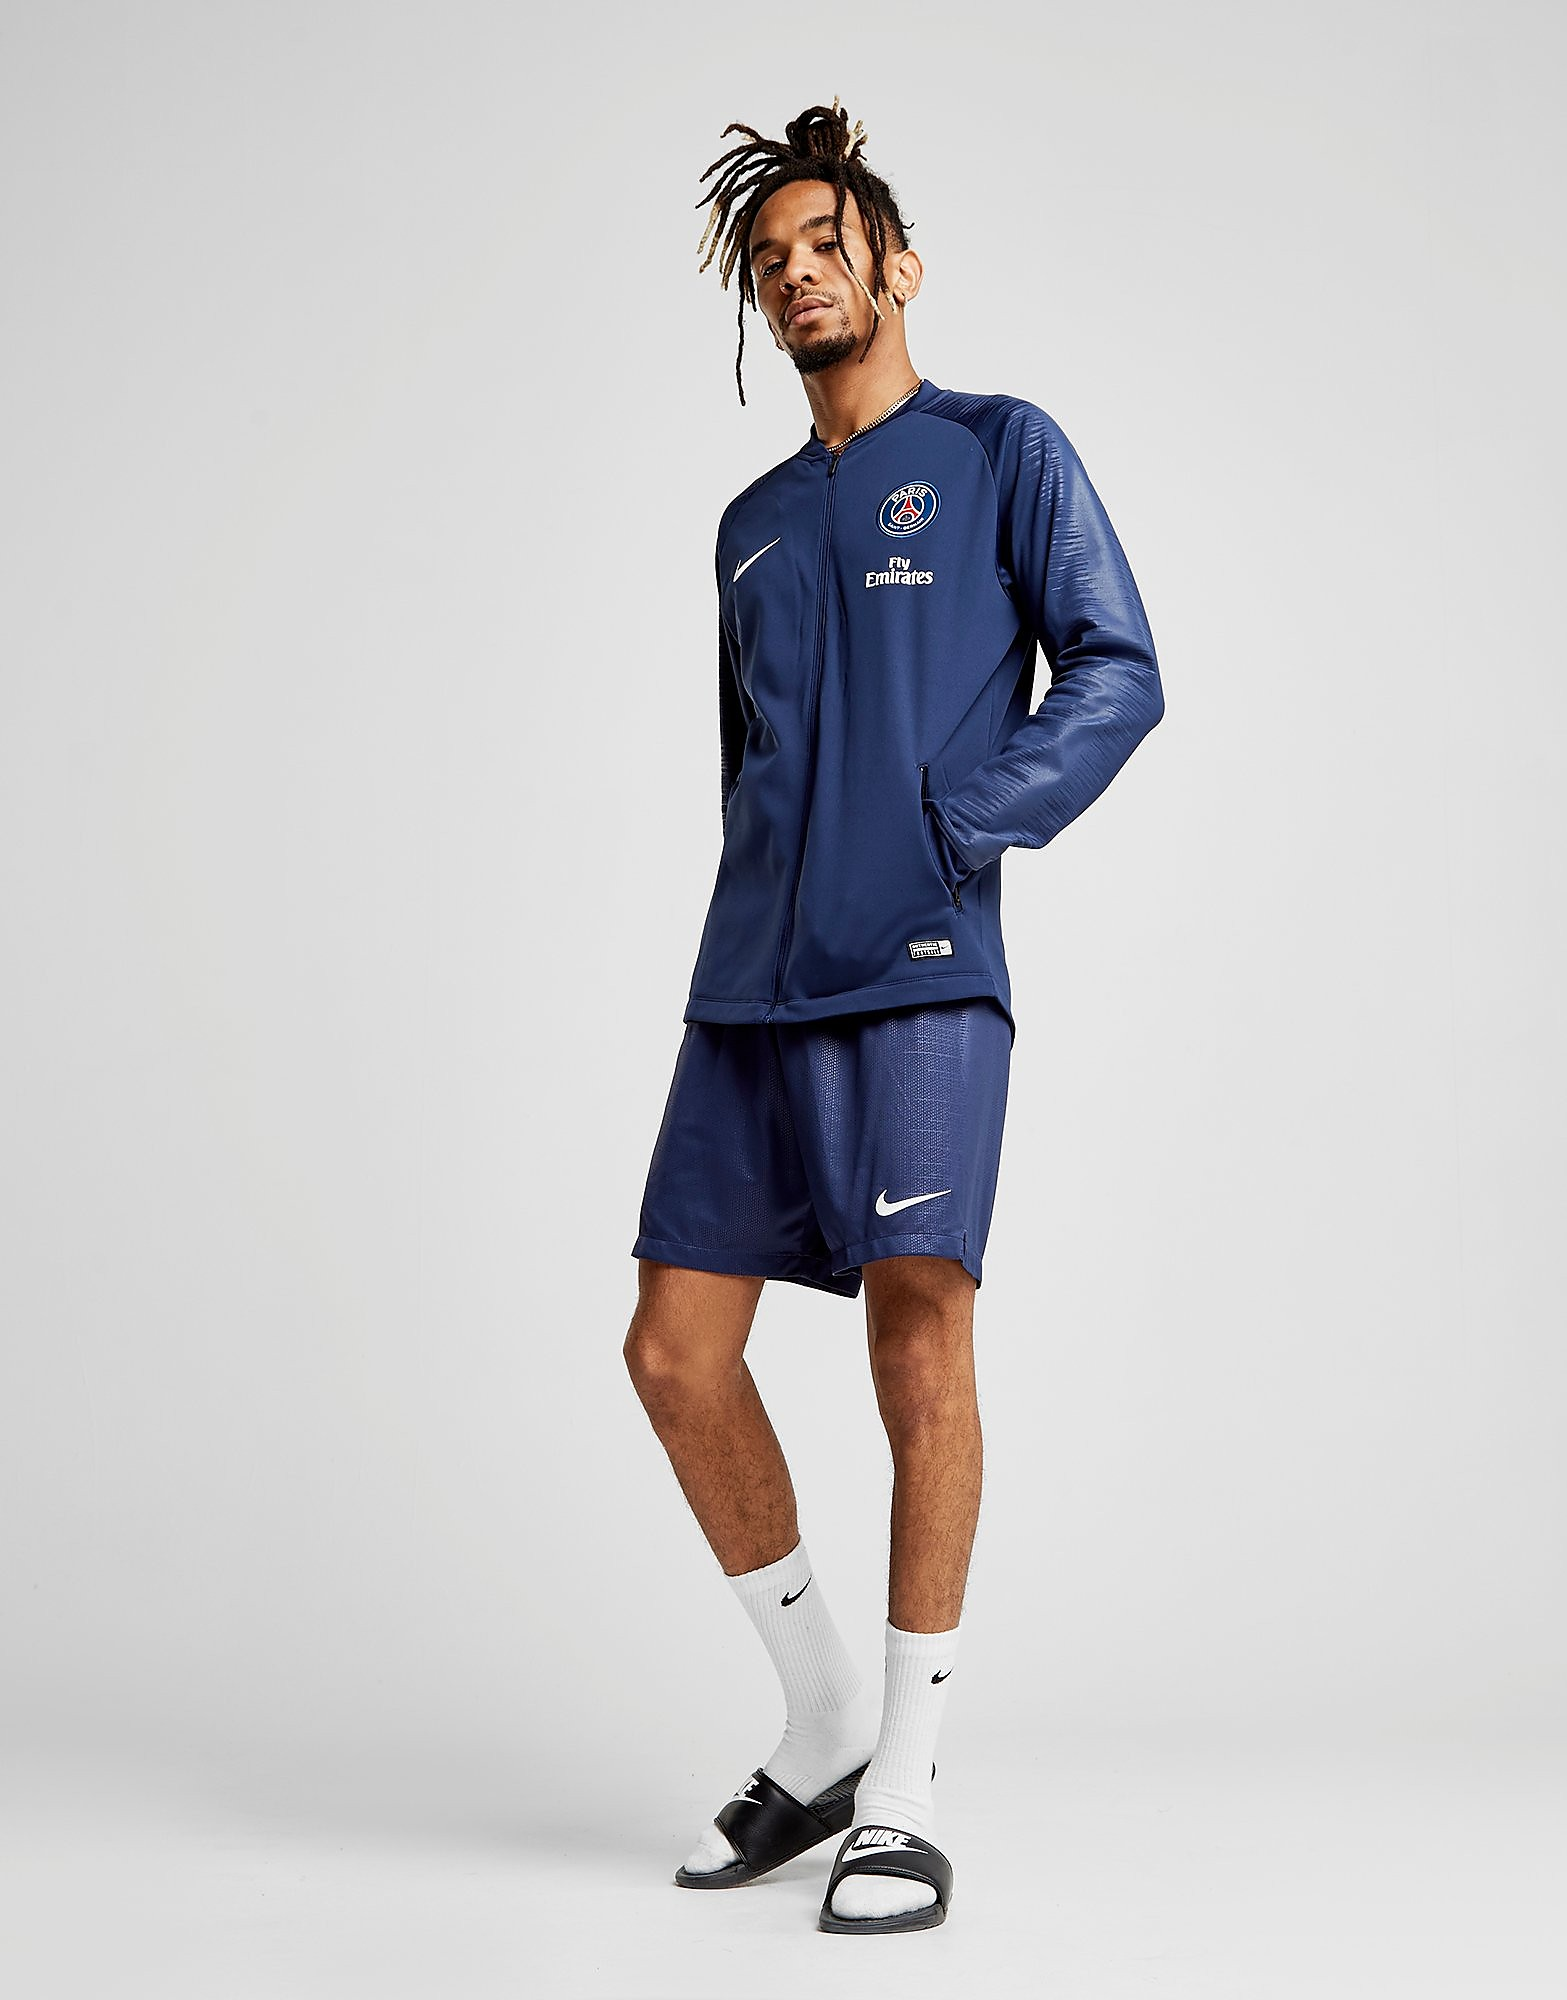 Nike Veste Anthem Paris Saint Germain 2018/19 Homme